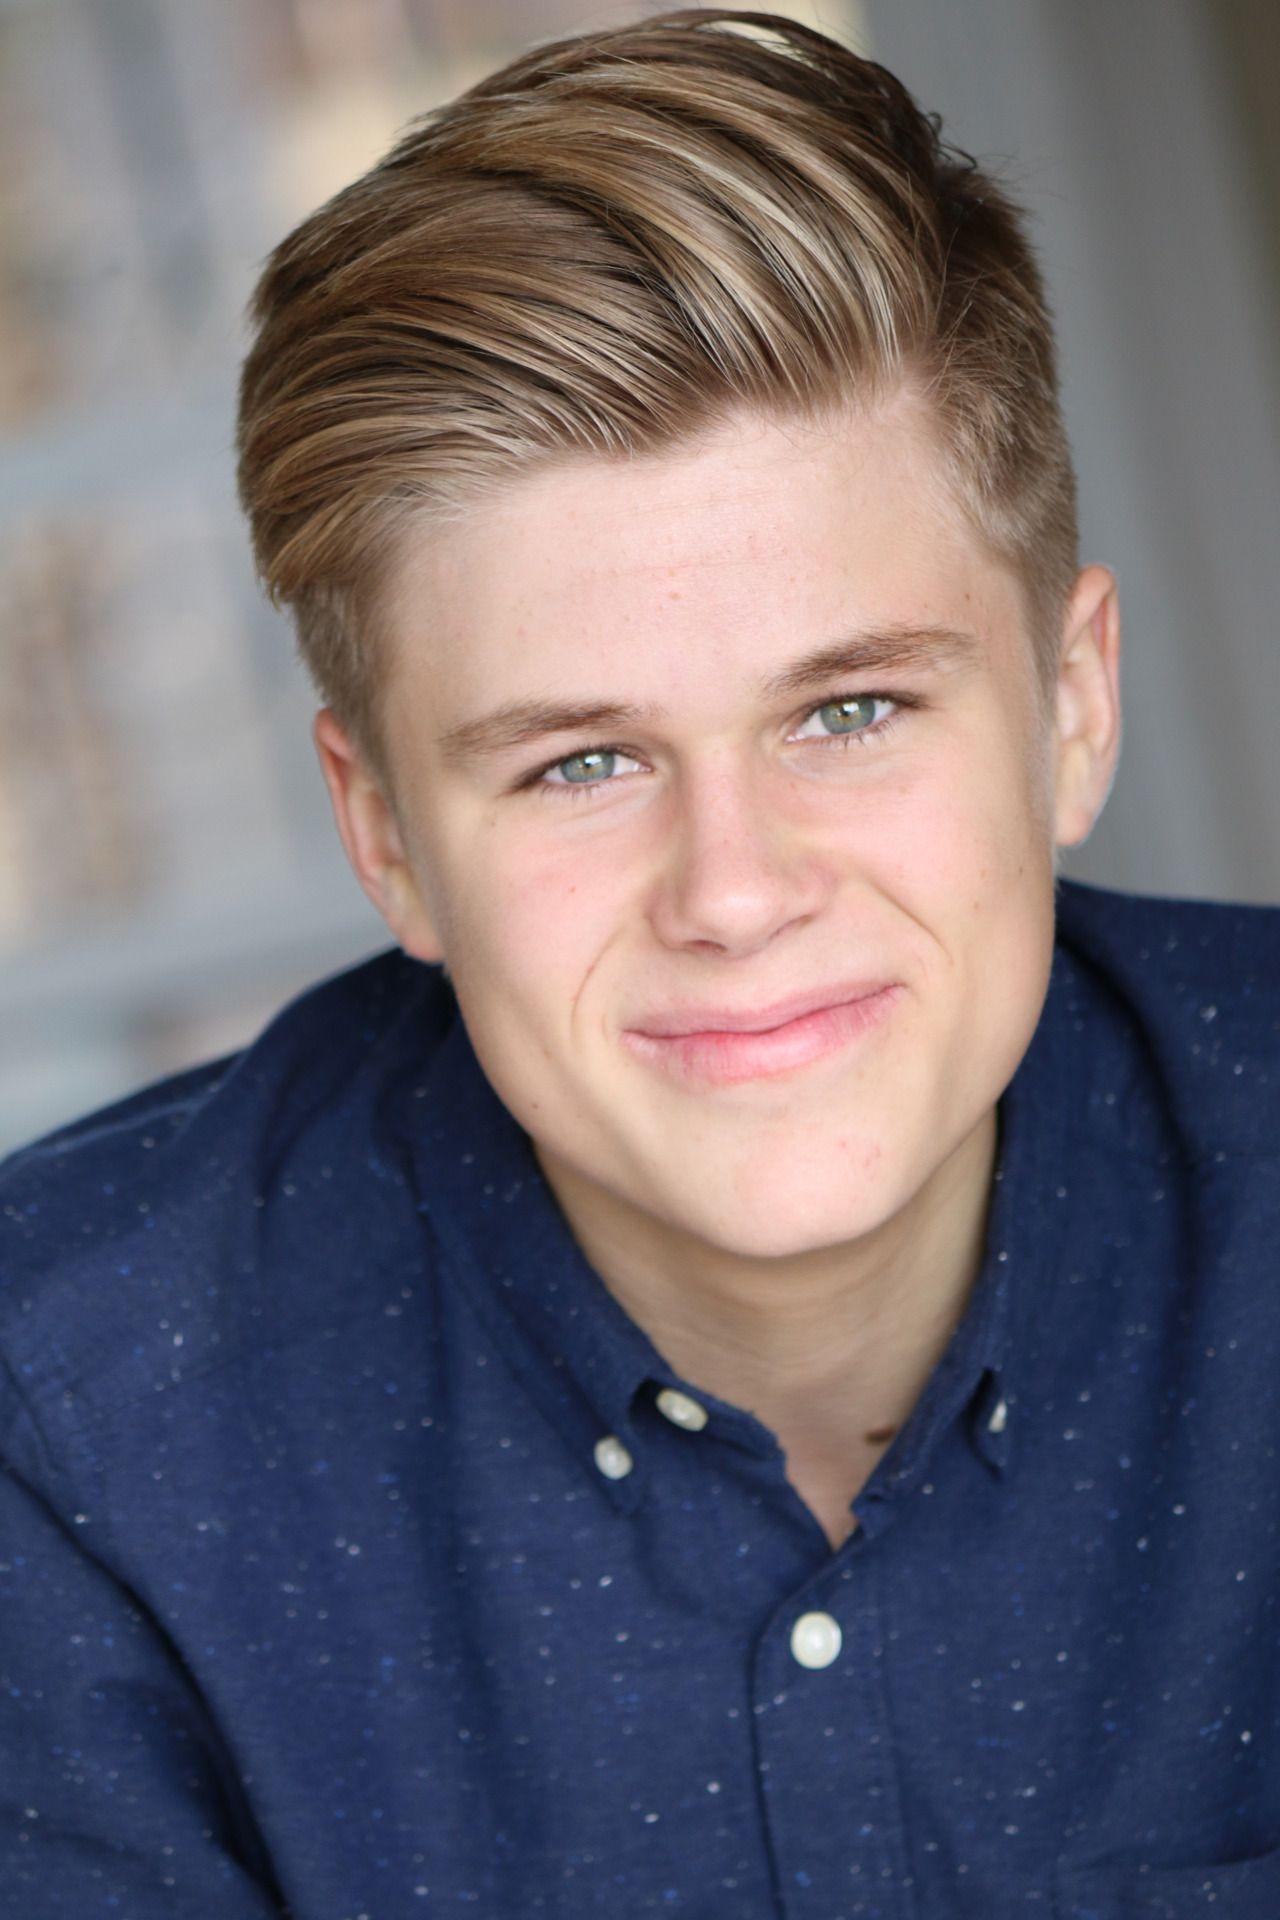 Owen joyner age